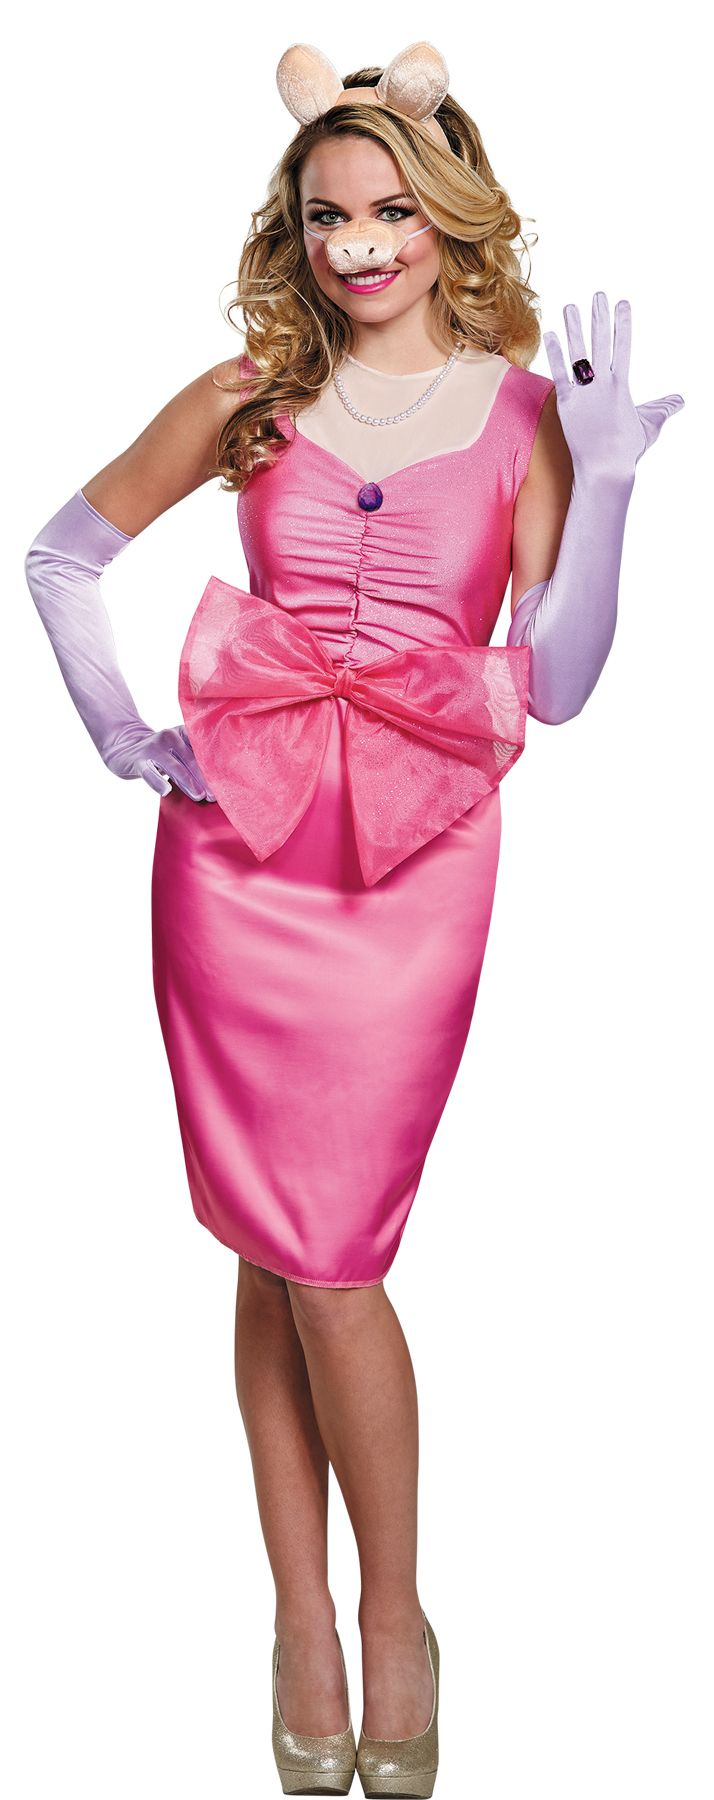 Women's Miss Piggy Deluxe Costume in 2019 Miss piggy